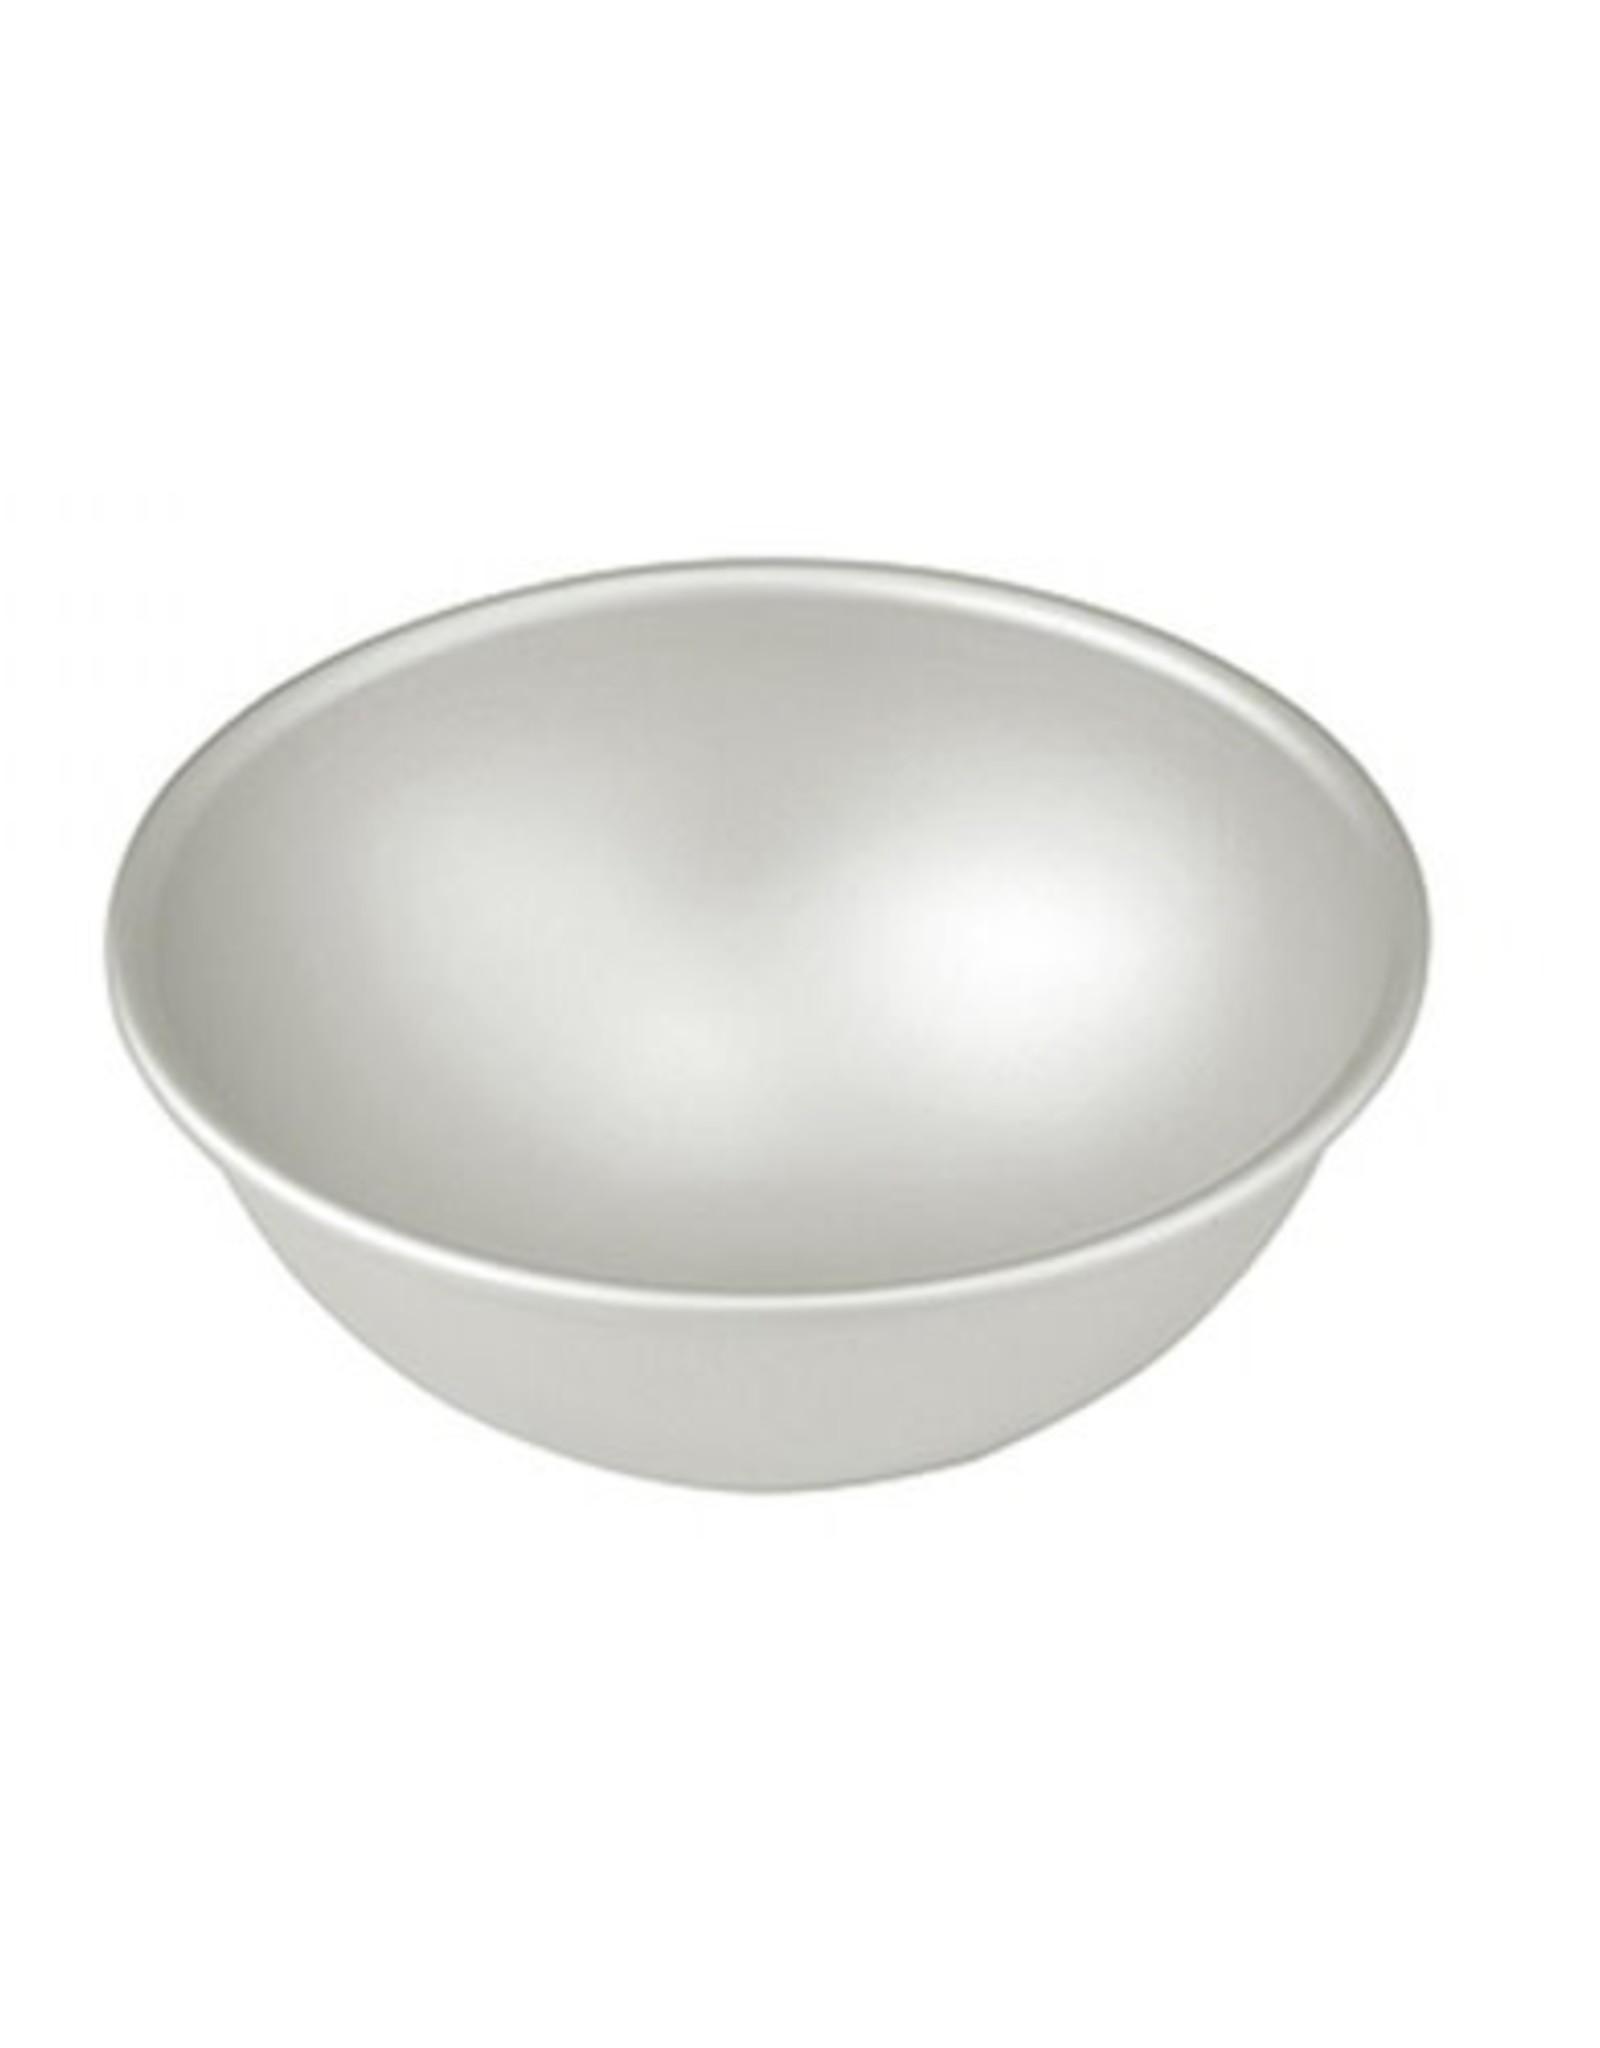 Fat Daddio's Fat Daddio's ProSeries Ball Pan (Hemisphere) -Ø22,5cm-